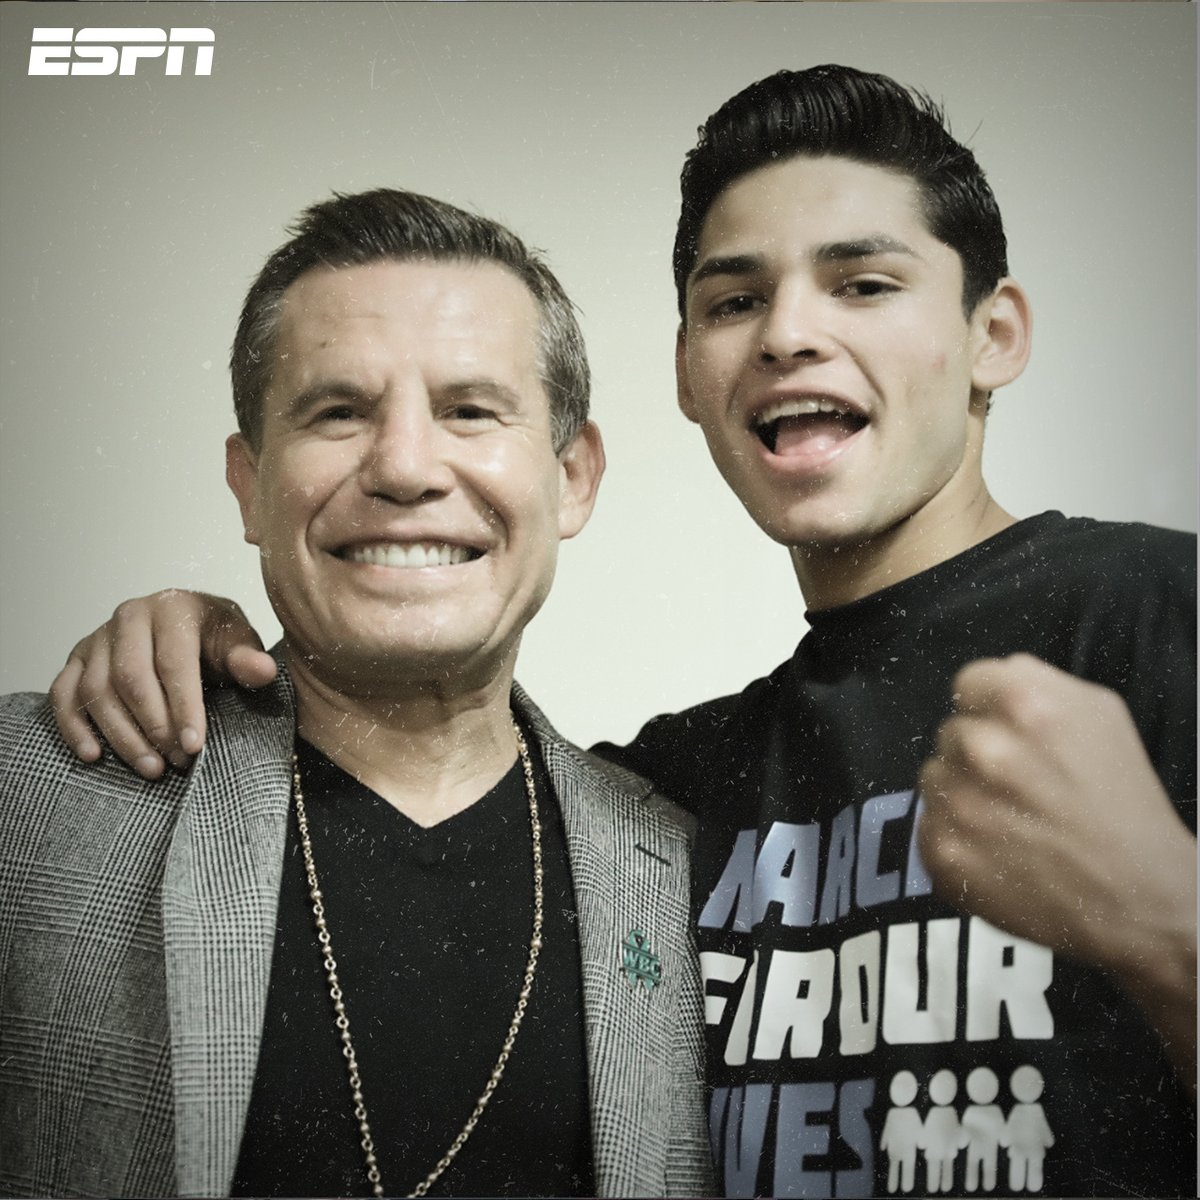 Boxing: Ryan Garcia Knocks out Fernando Vargas in first round (VIDEO) - Garcia